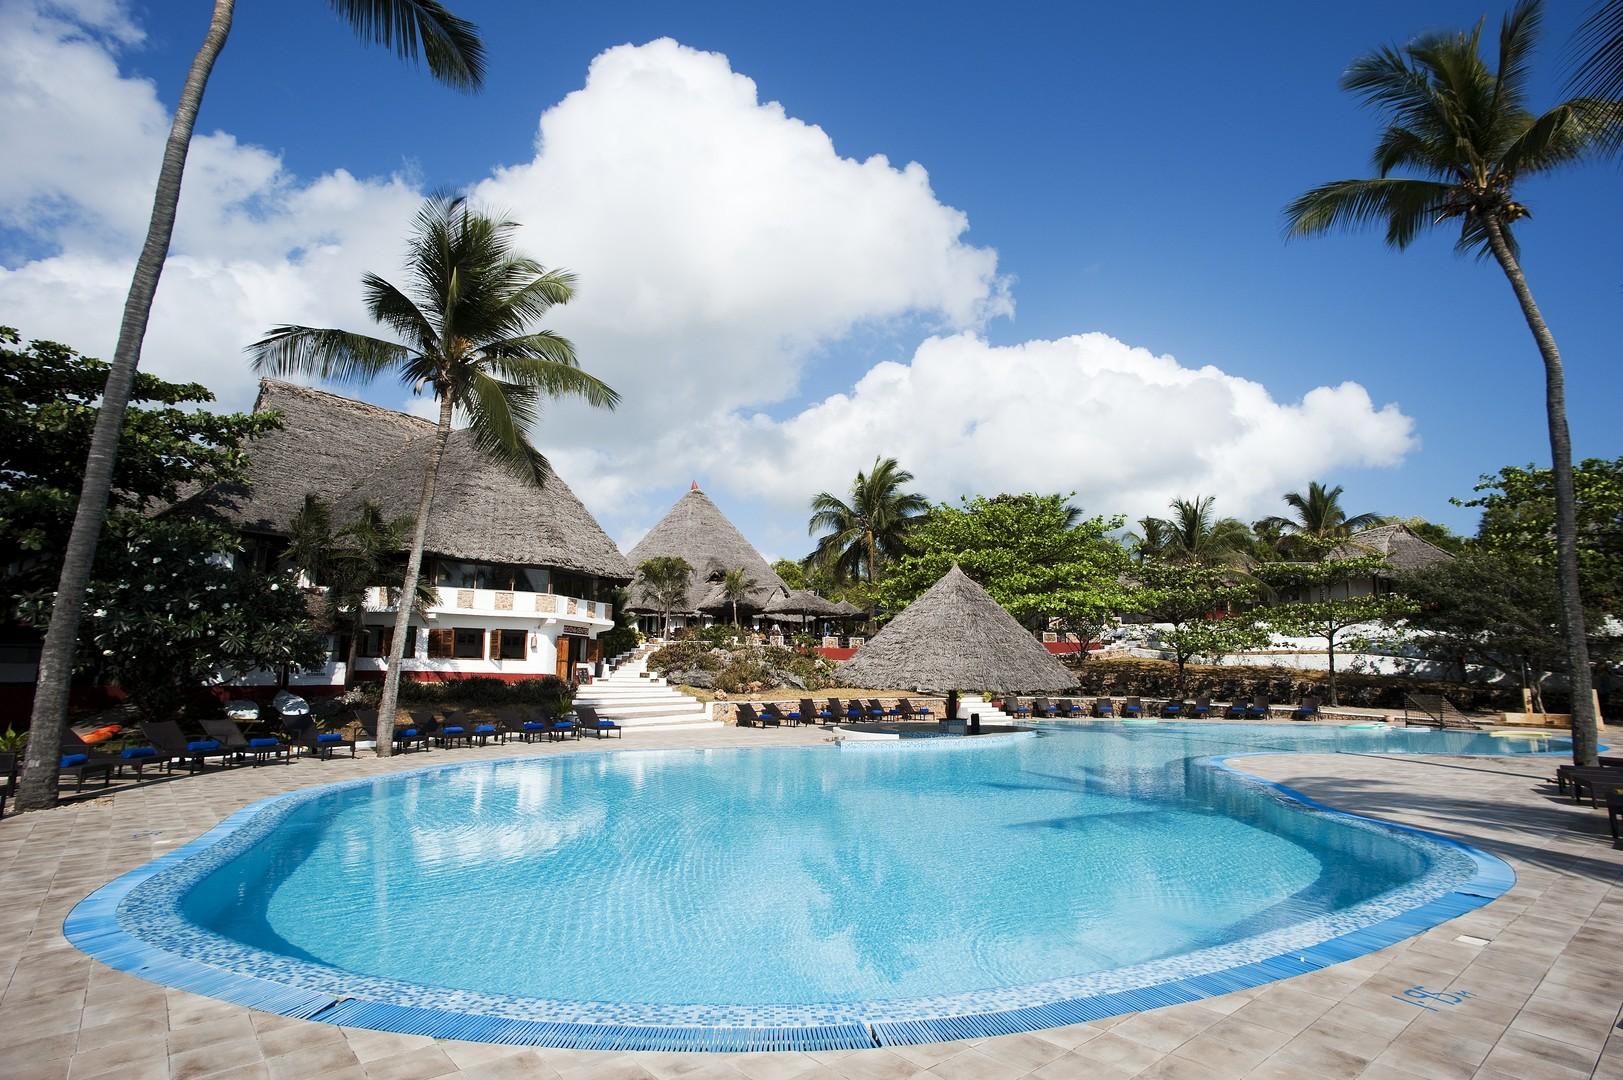 Hotel Karafuu Beach Resort #2